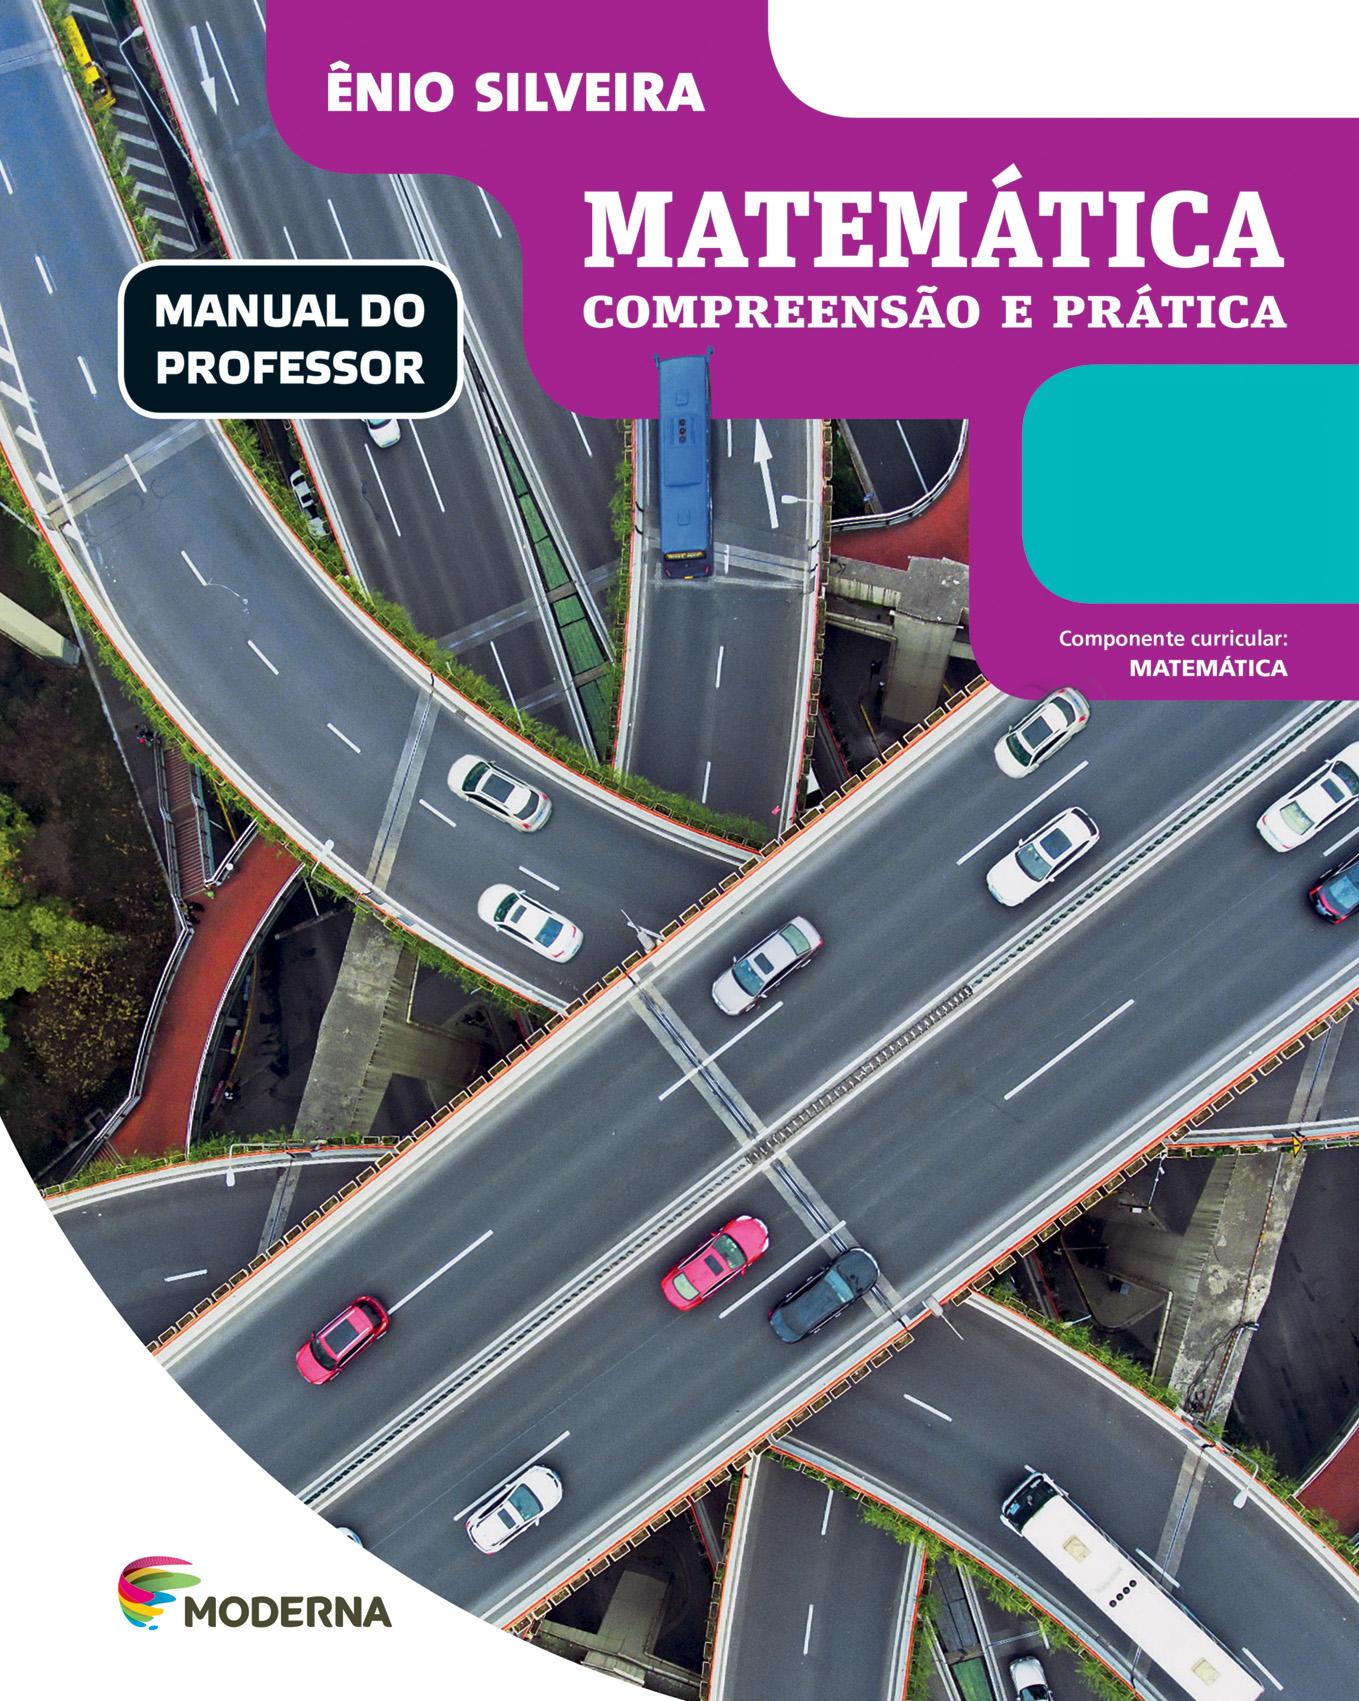 Matematica Compreensao E Pratica Pnld Moderna